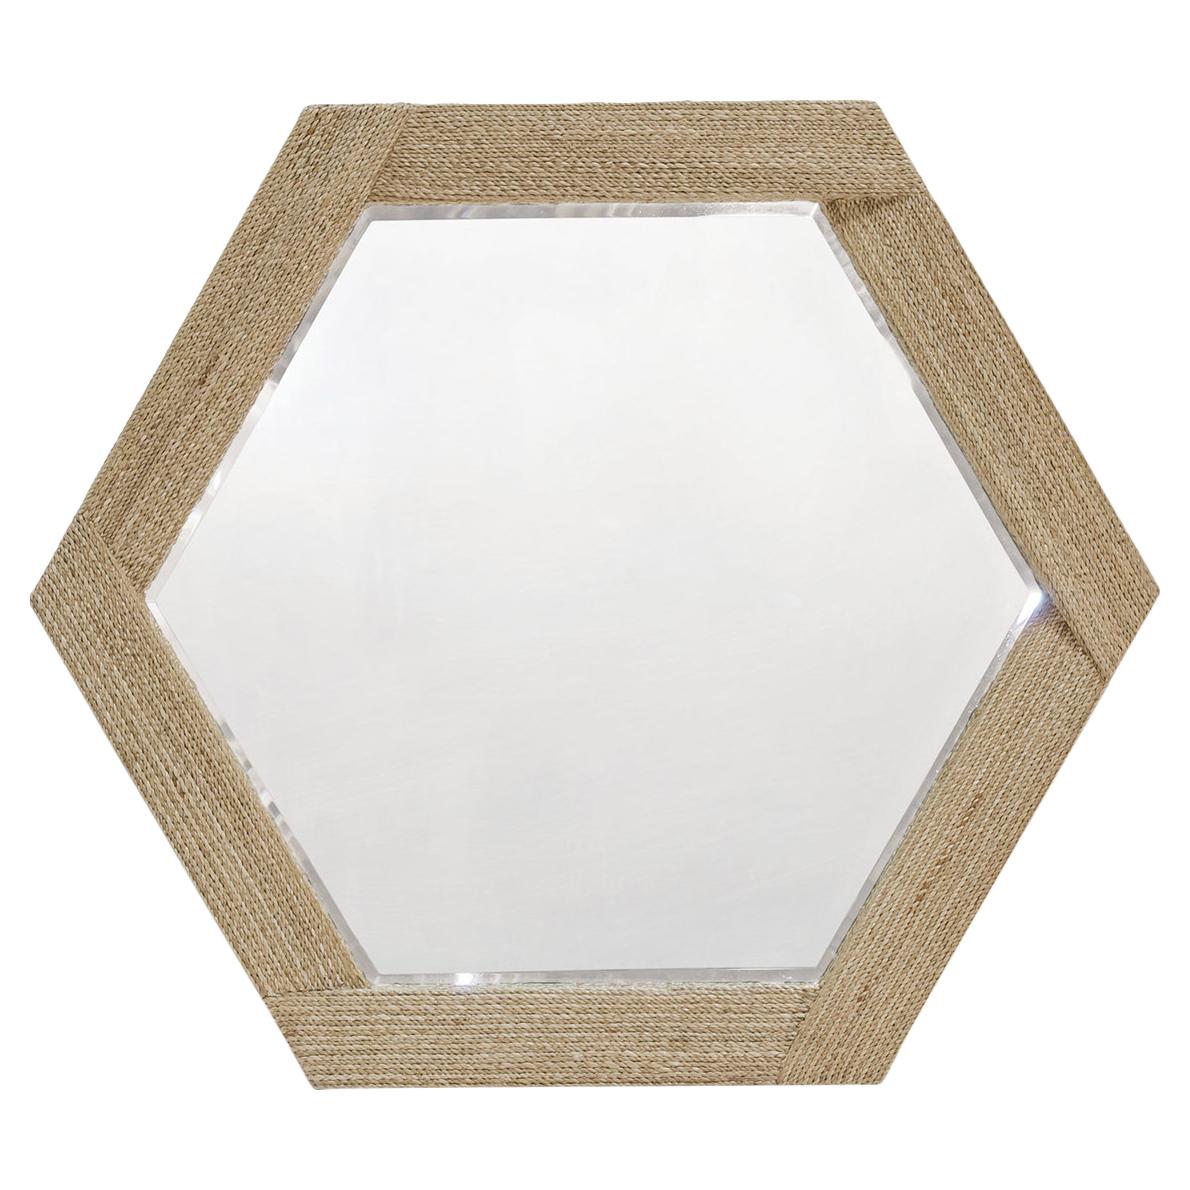 Alethea Coastal Natural Seagrass Rope Hexagon Mirror